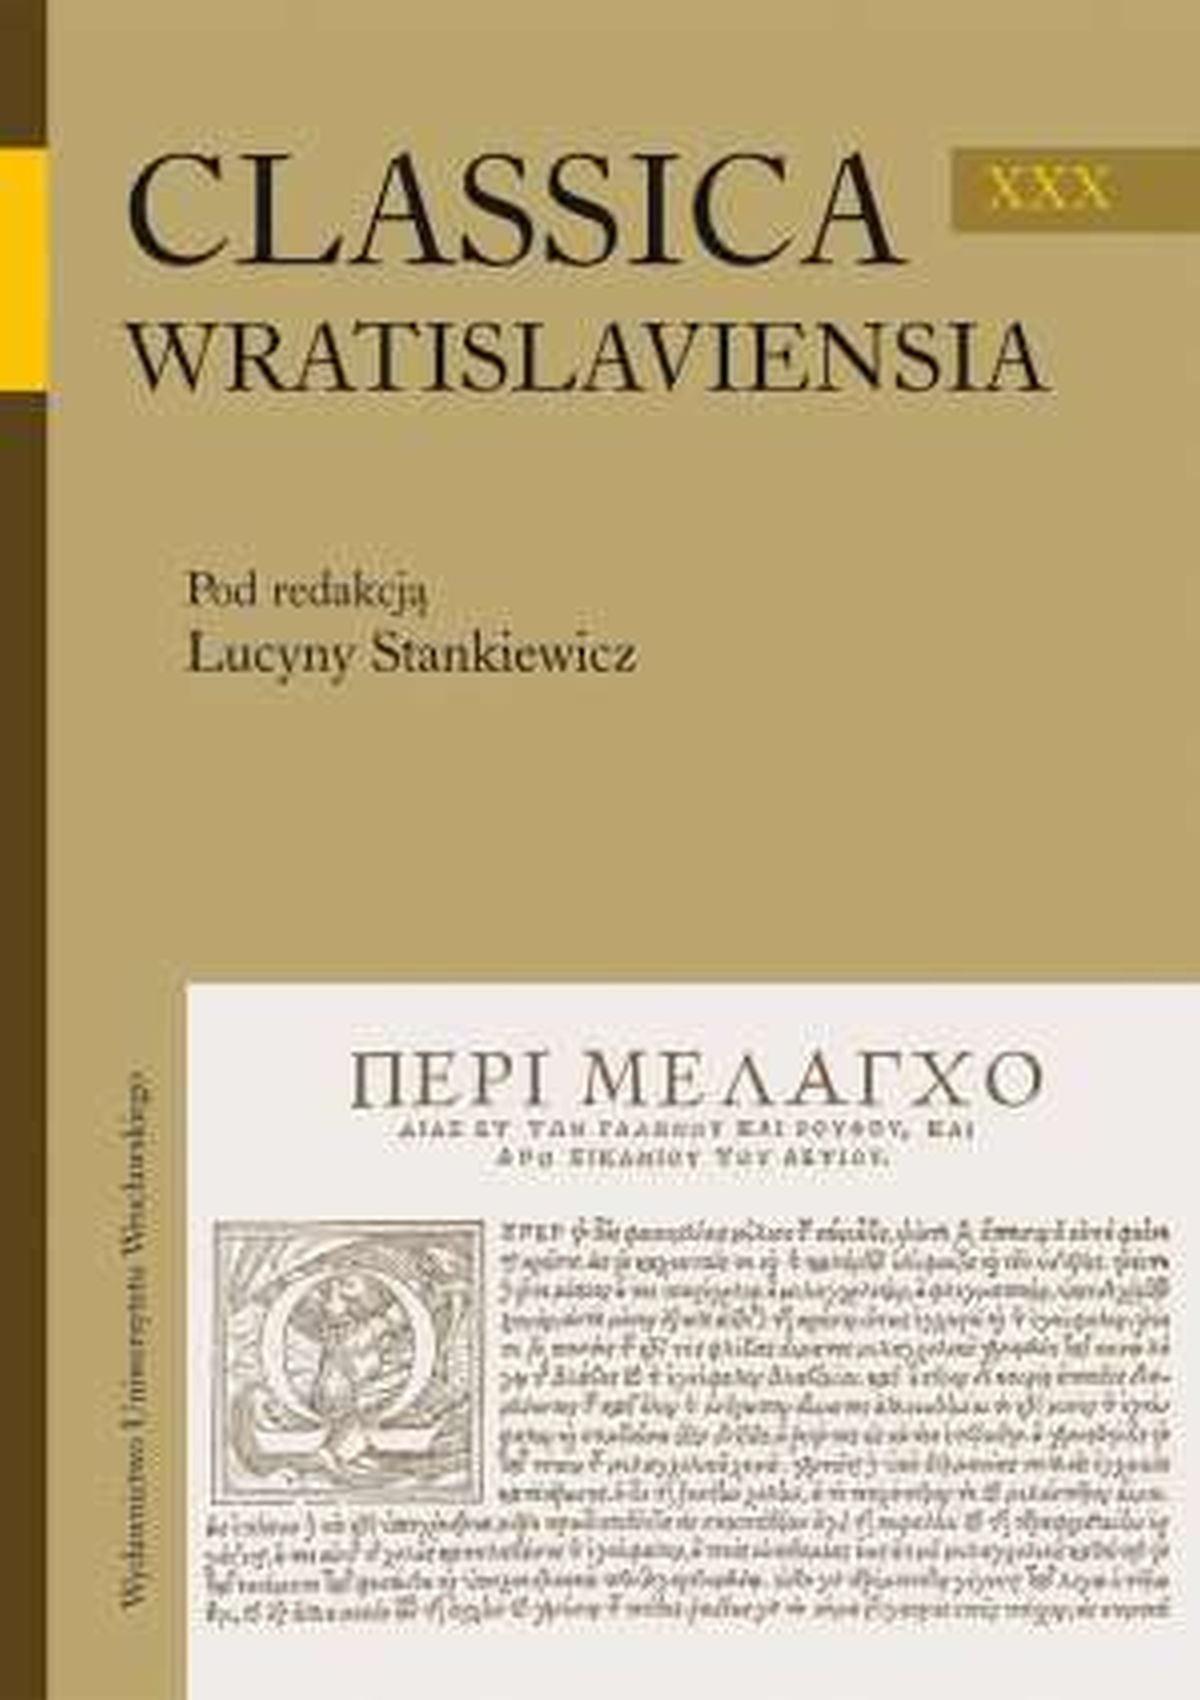 Classica Wratislaviensia XXX